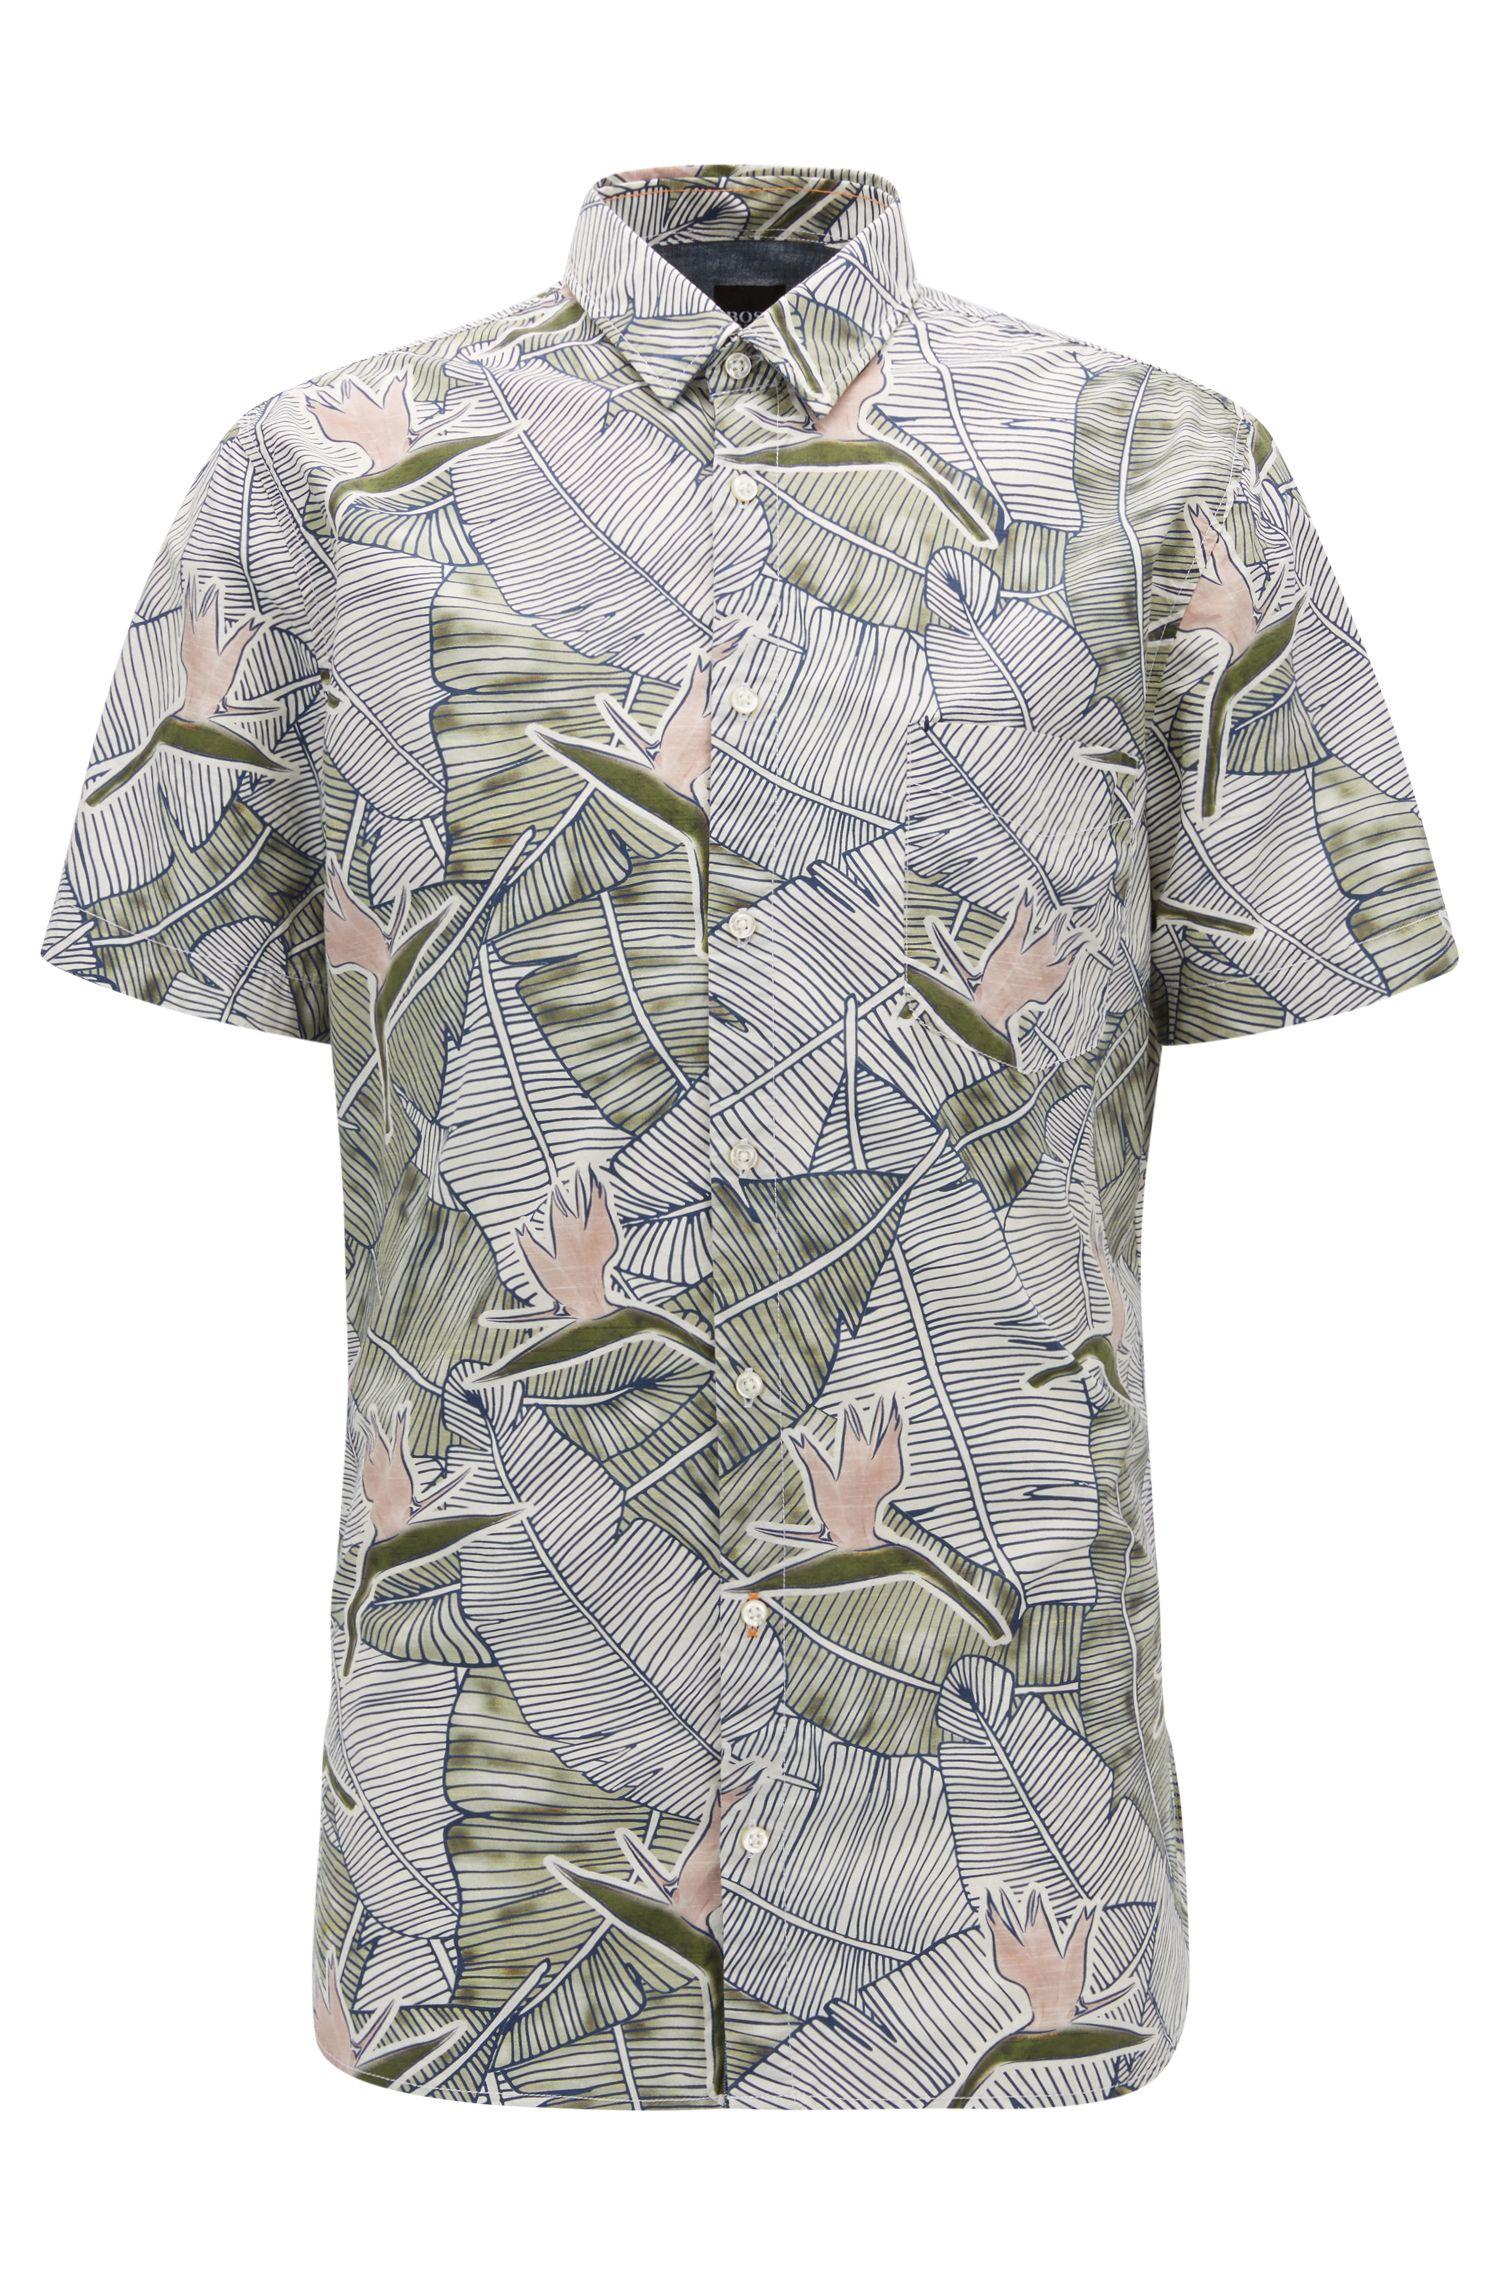 Tropical-Print Cotton Sport Shirt, Slim Fit | Catittude Short